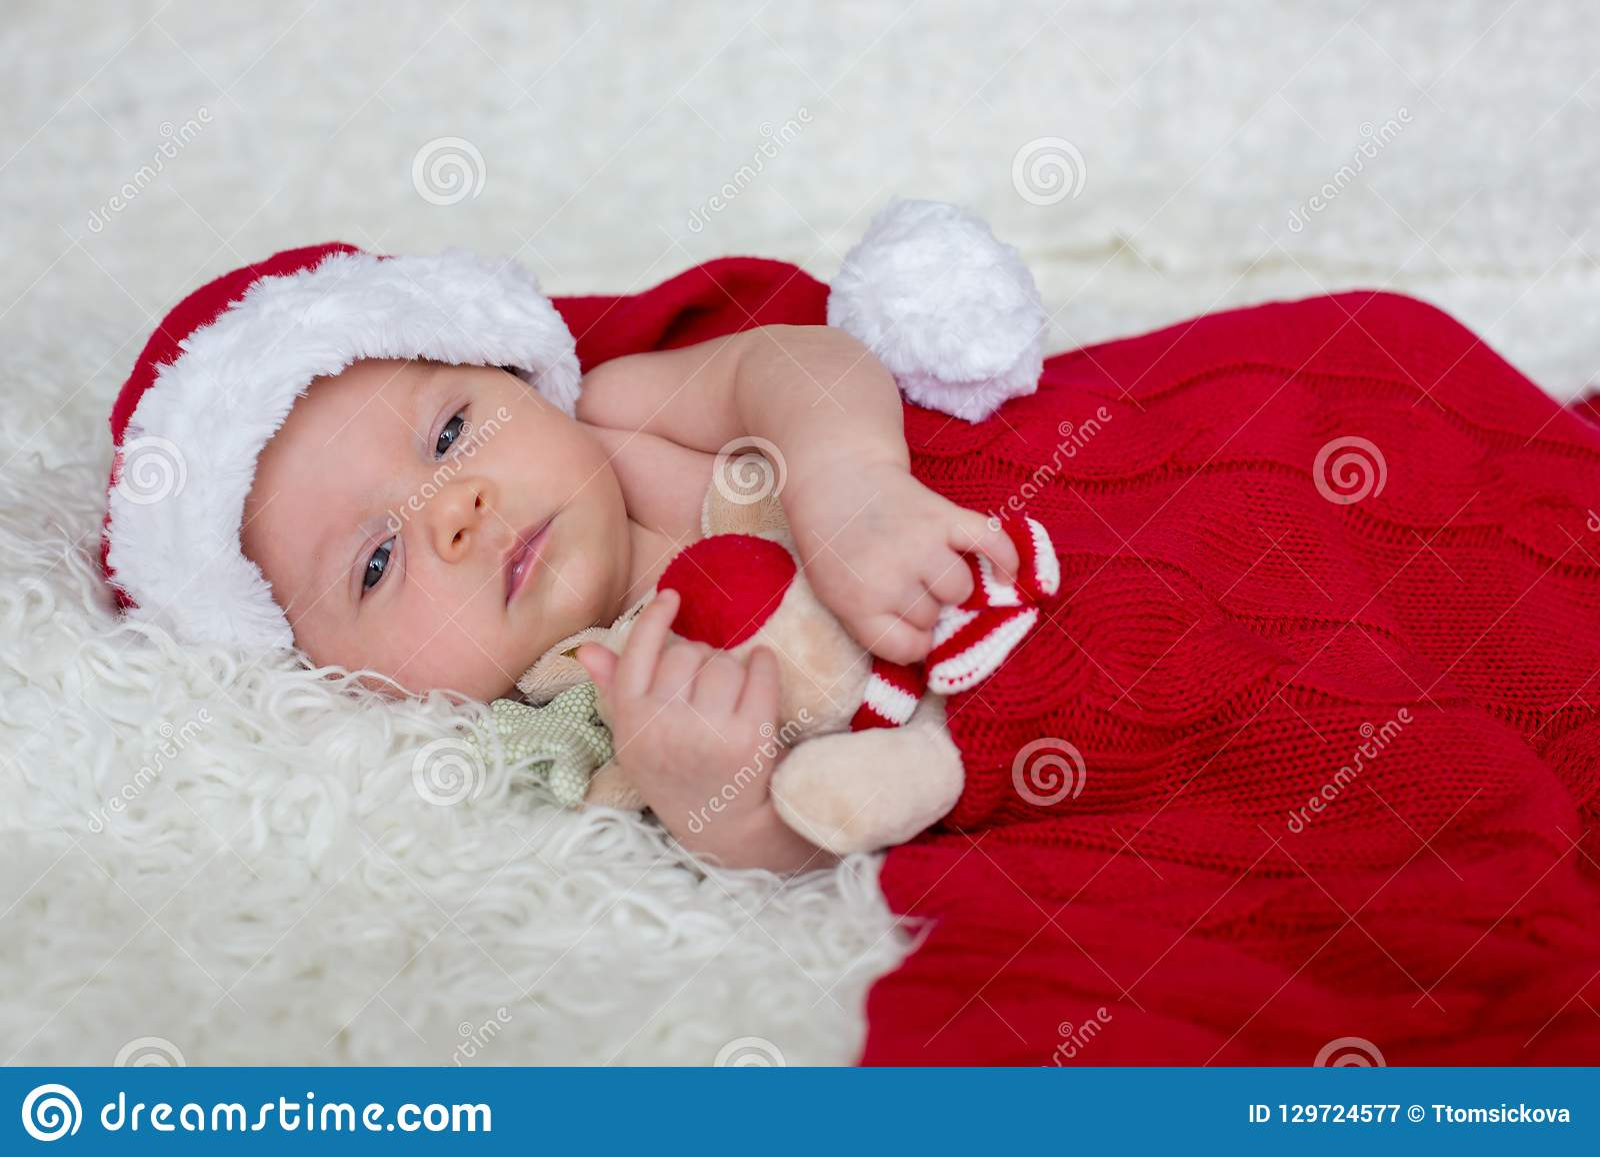 204a1bdb7 Little Newborn Baby Boy, Wearing Santa Hat Stock Image - Image of ...